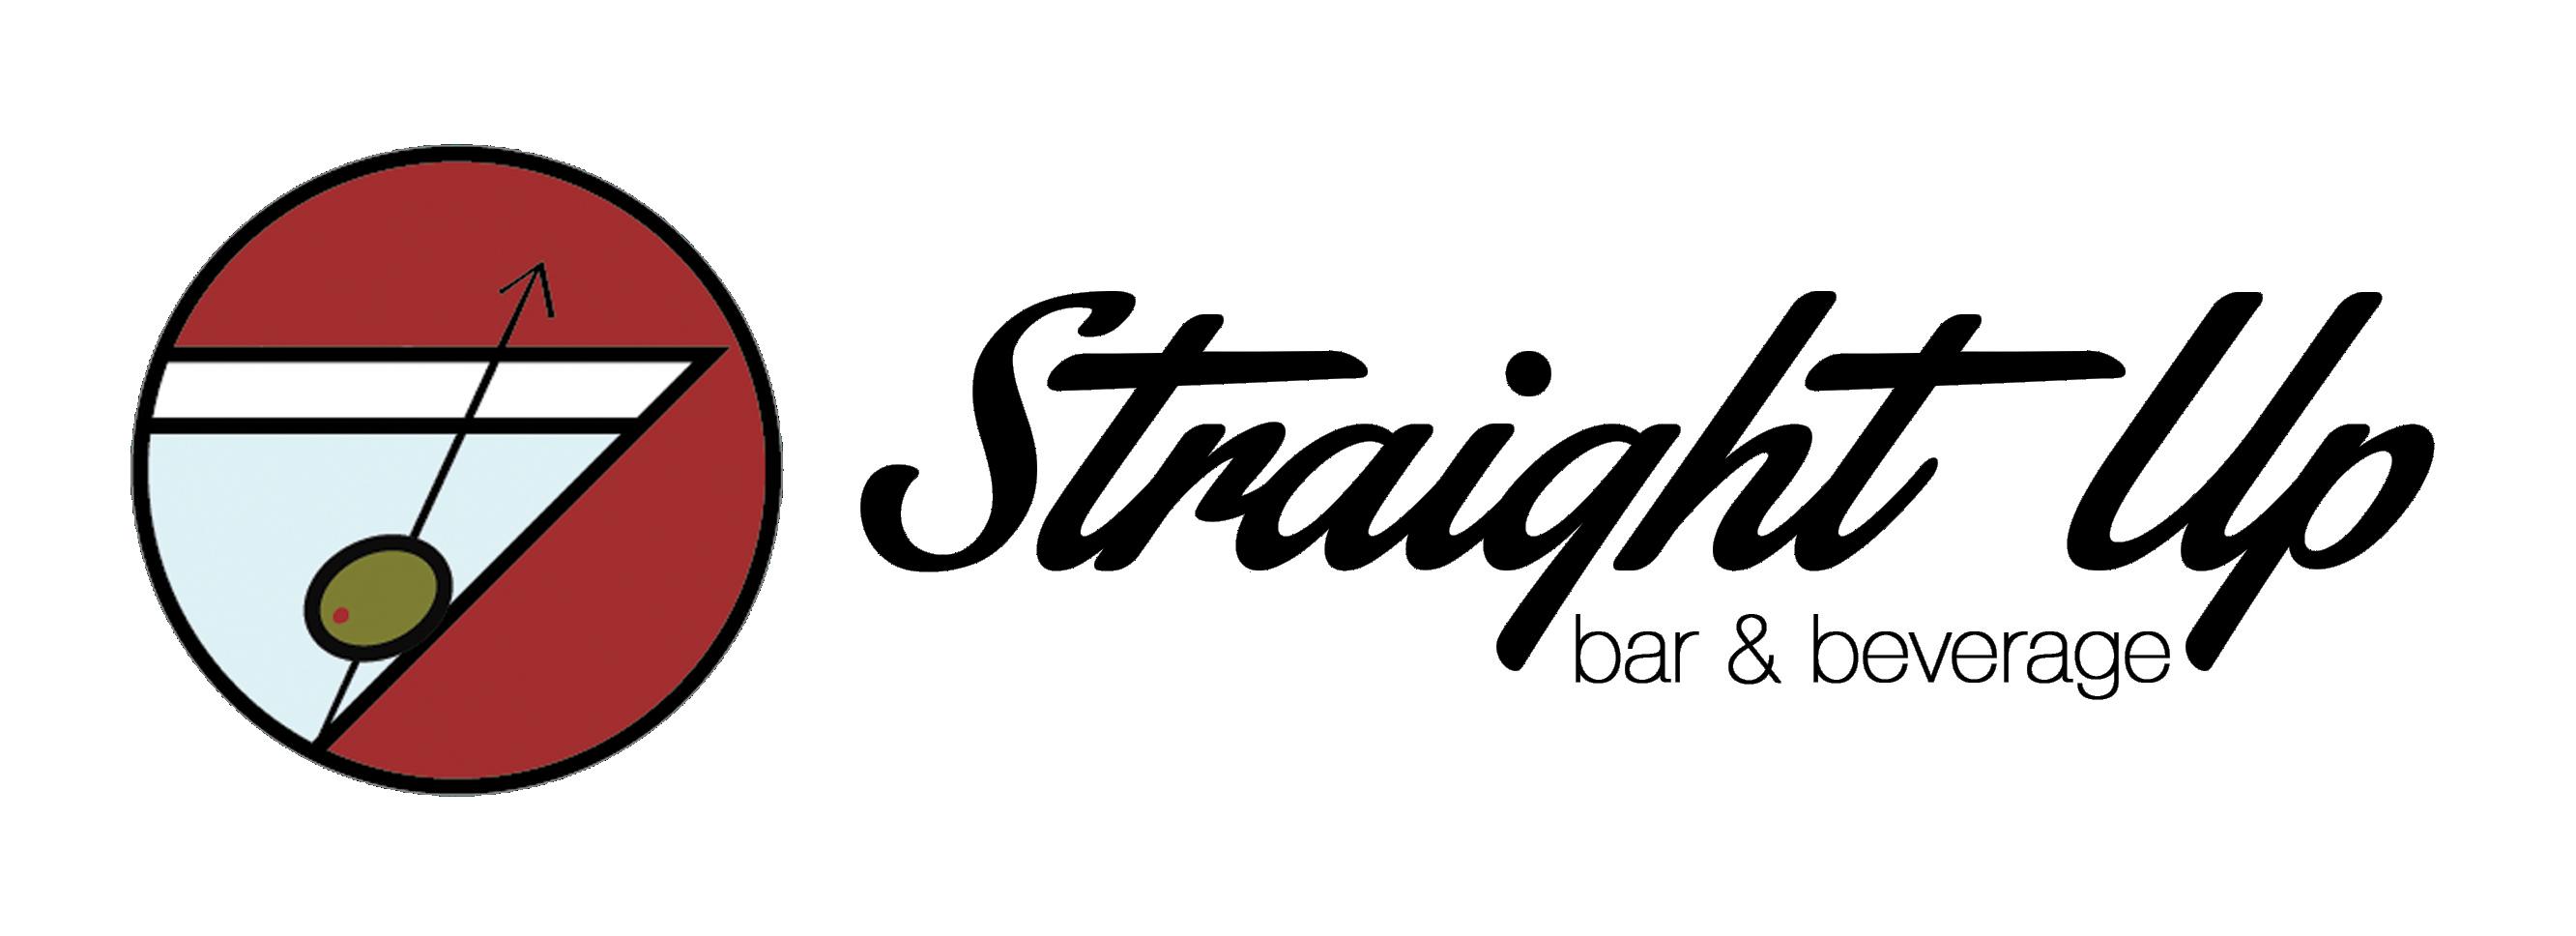 straightup_logo noback